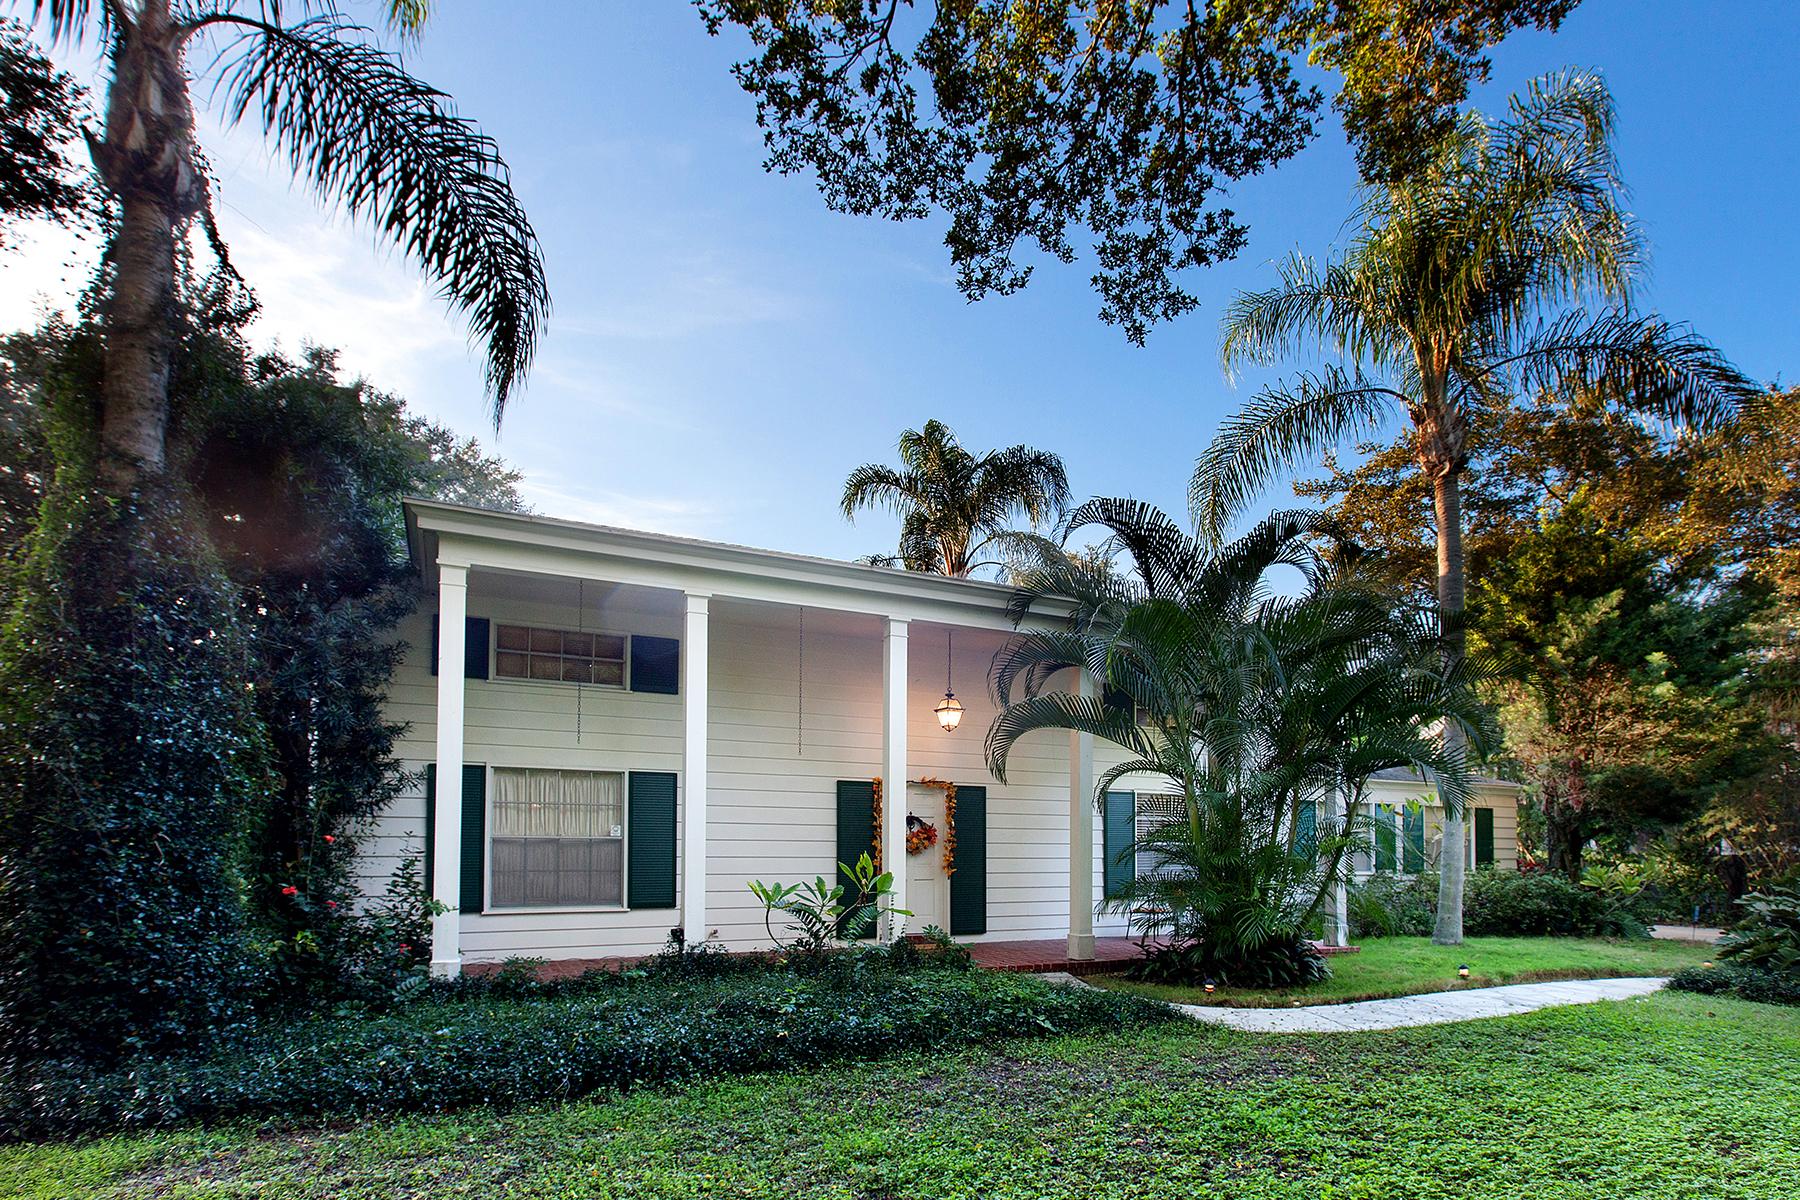 Single Family Home for Sale at SARASOTA, FL 1600 N Lodge Dr Sarasota, Florida 34239 United States